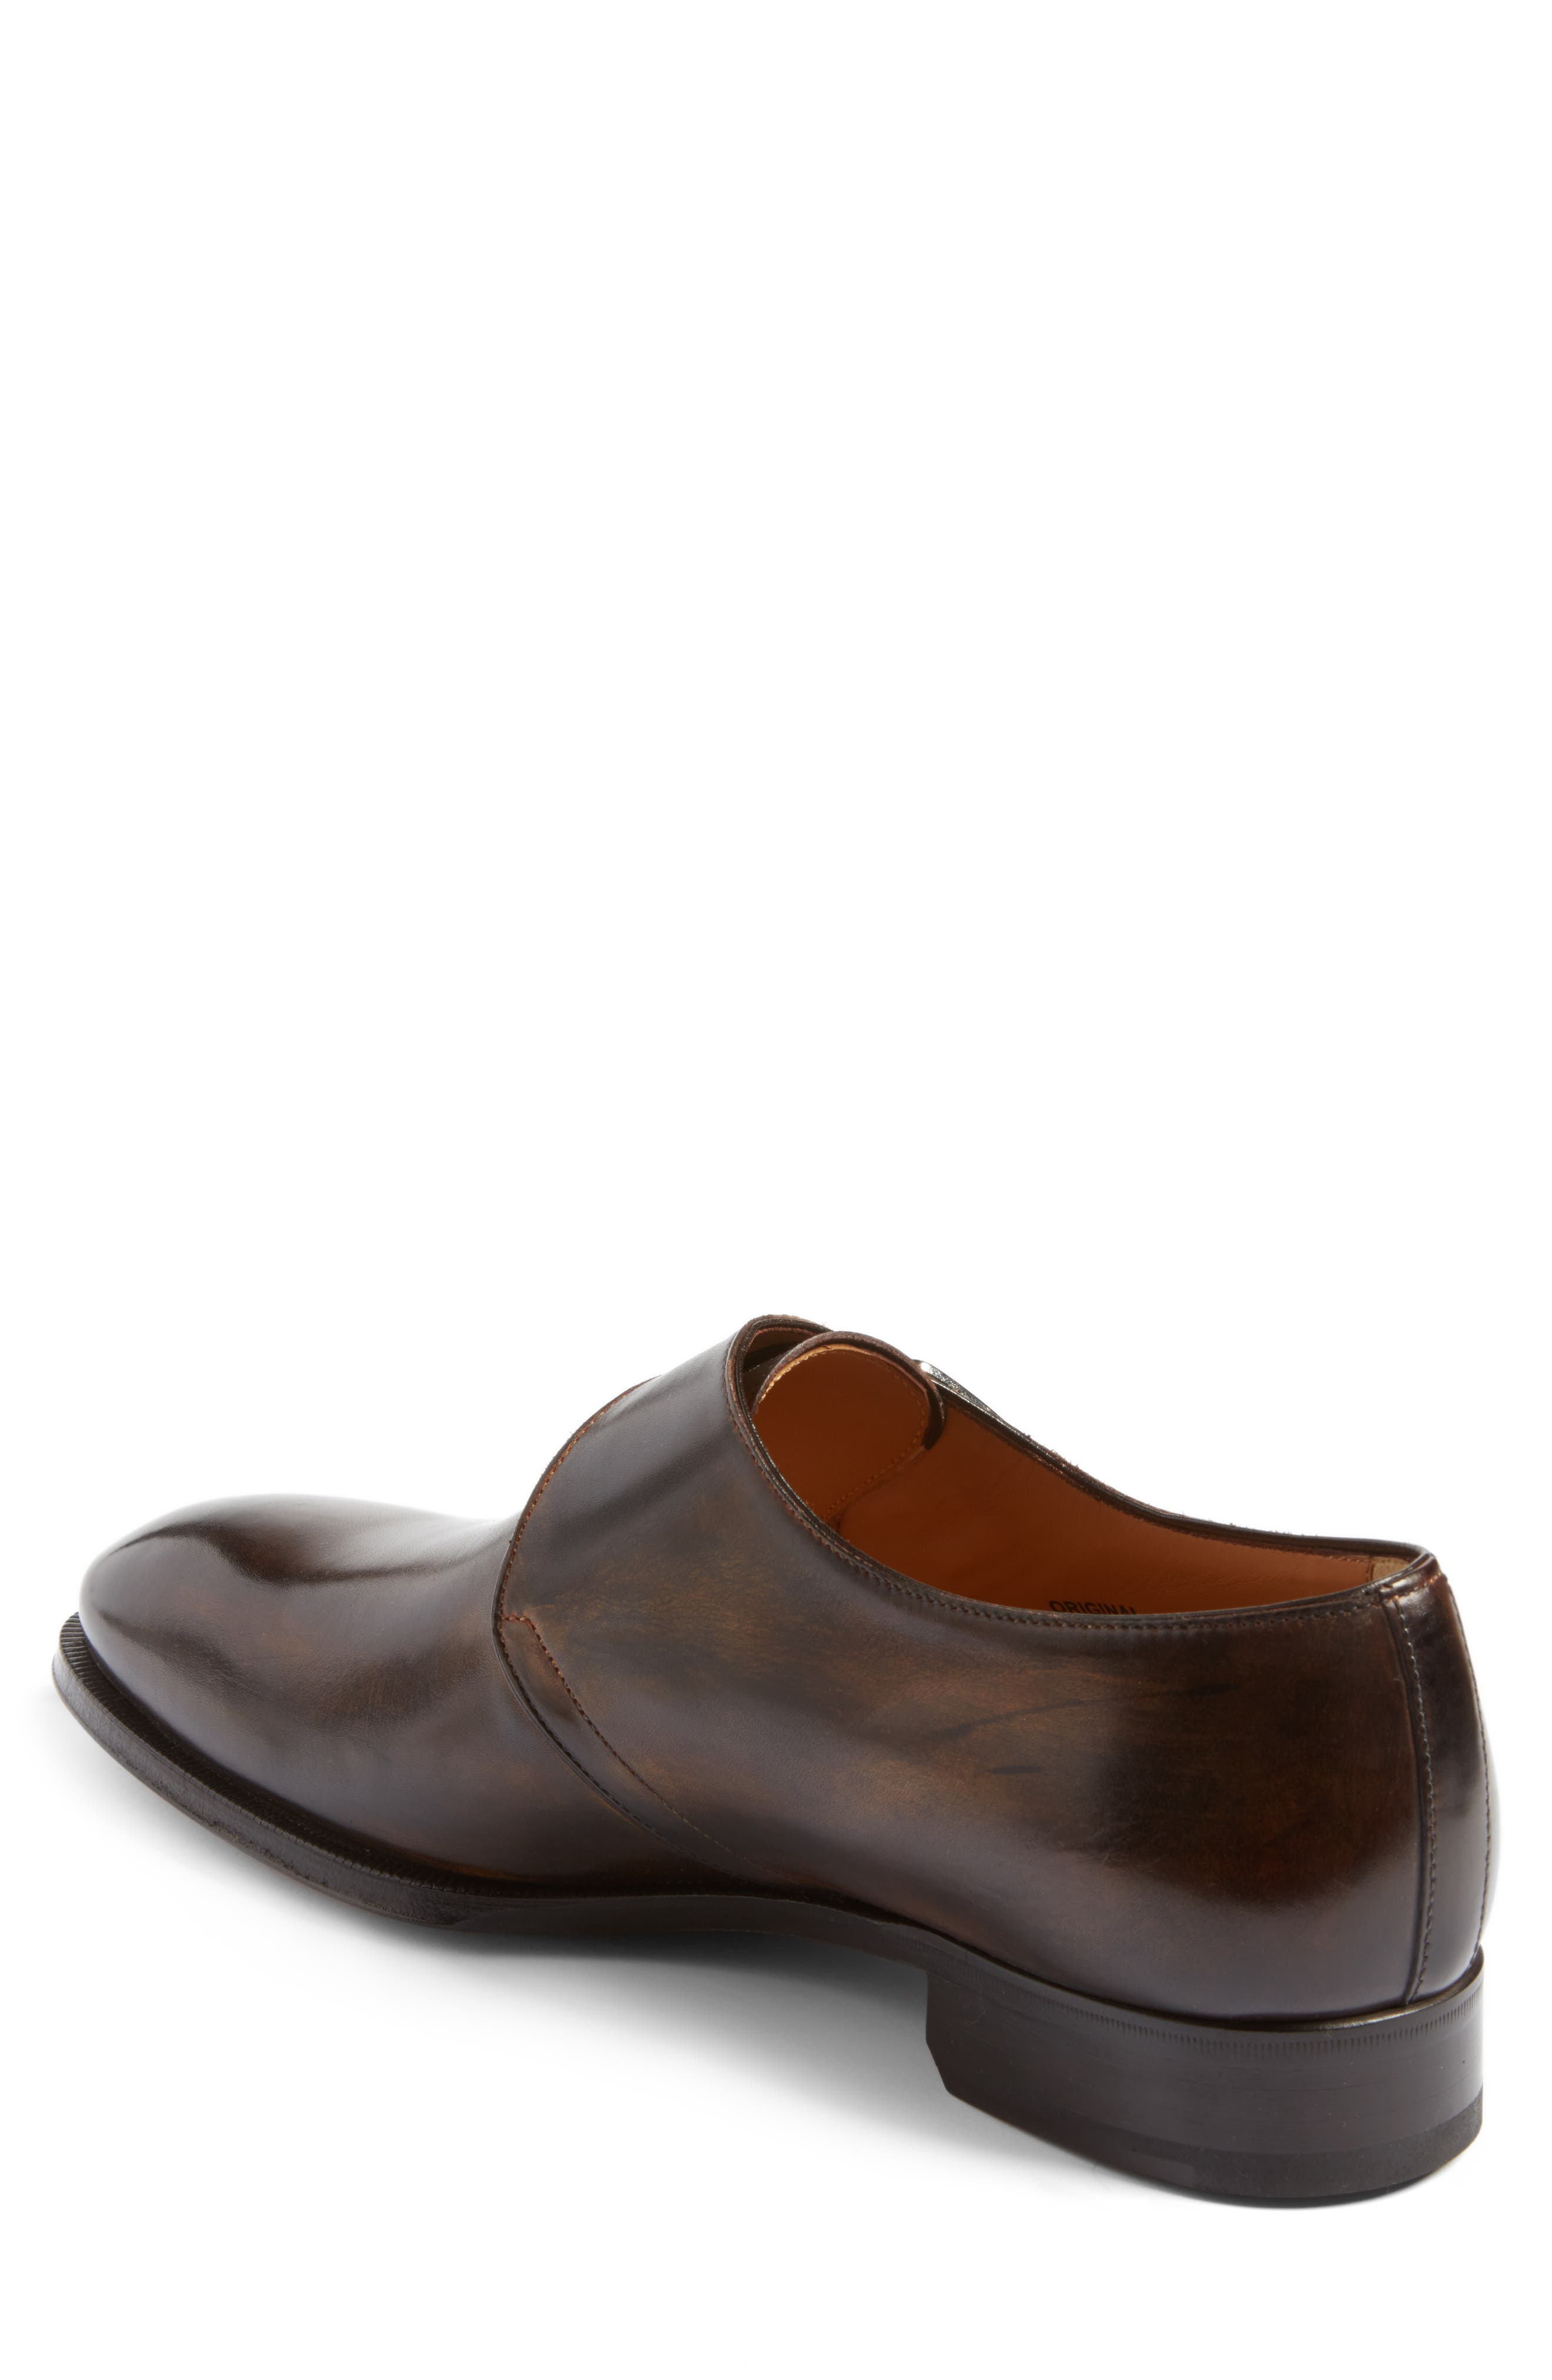 Monk Strap Shoe,                             Alternate thumbnail 2, color,                             Brown